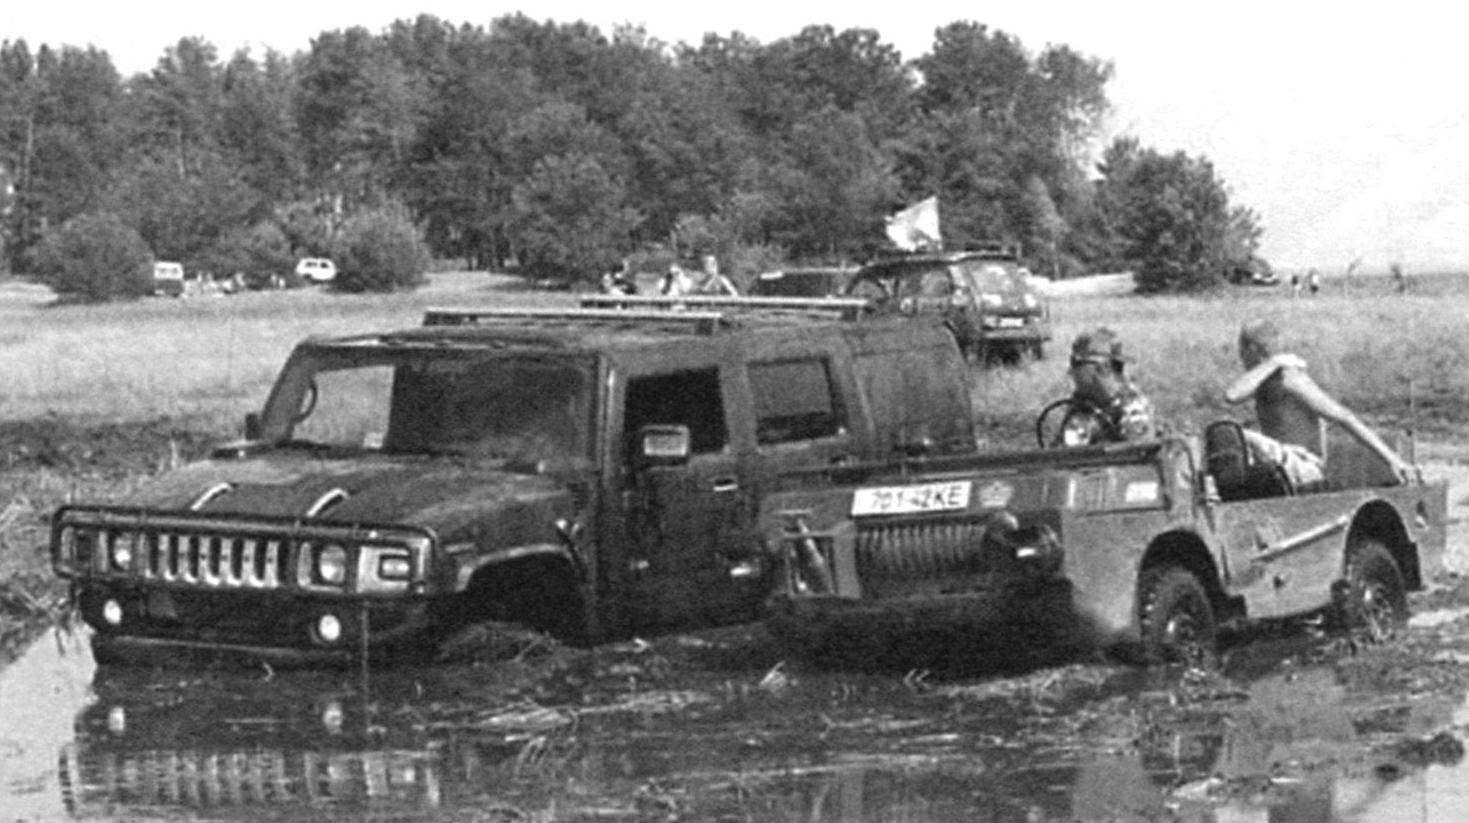 Compact army jeep-amphibious vehicle LUAZ-967